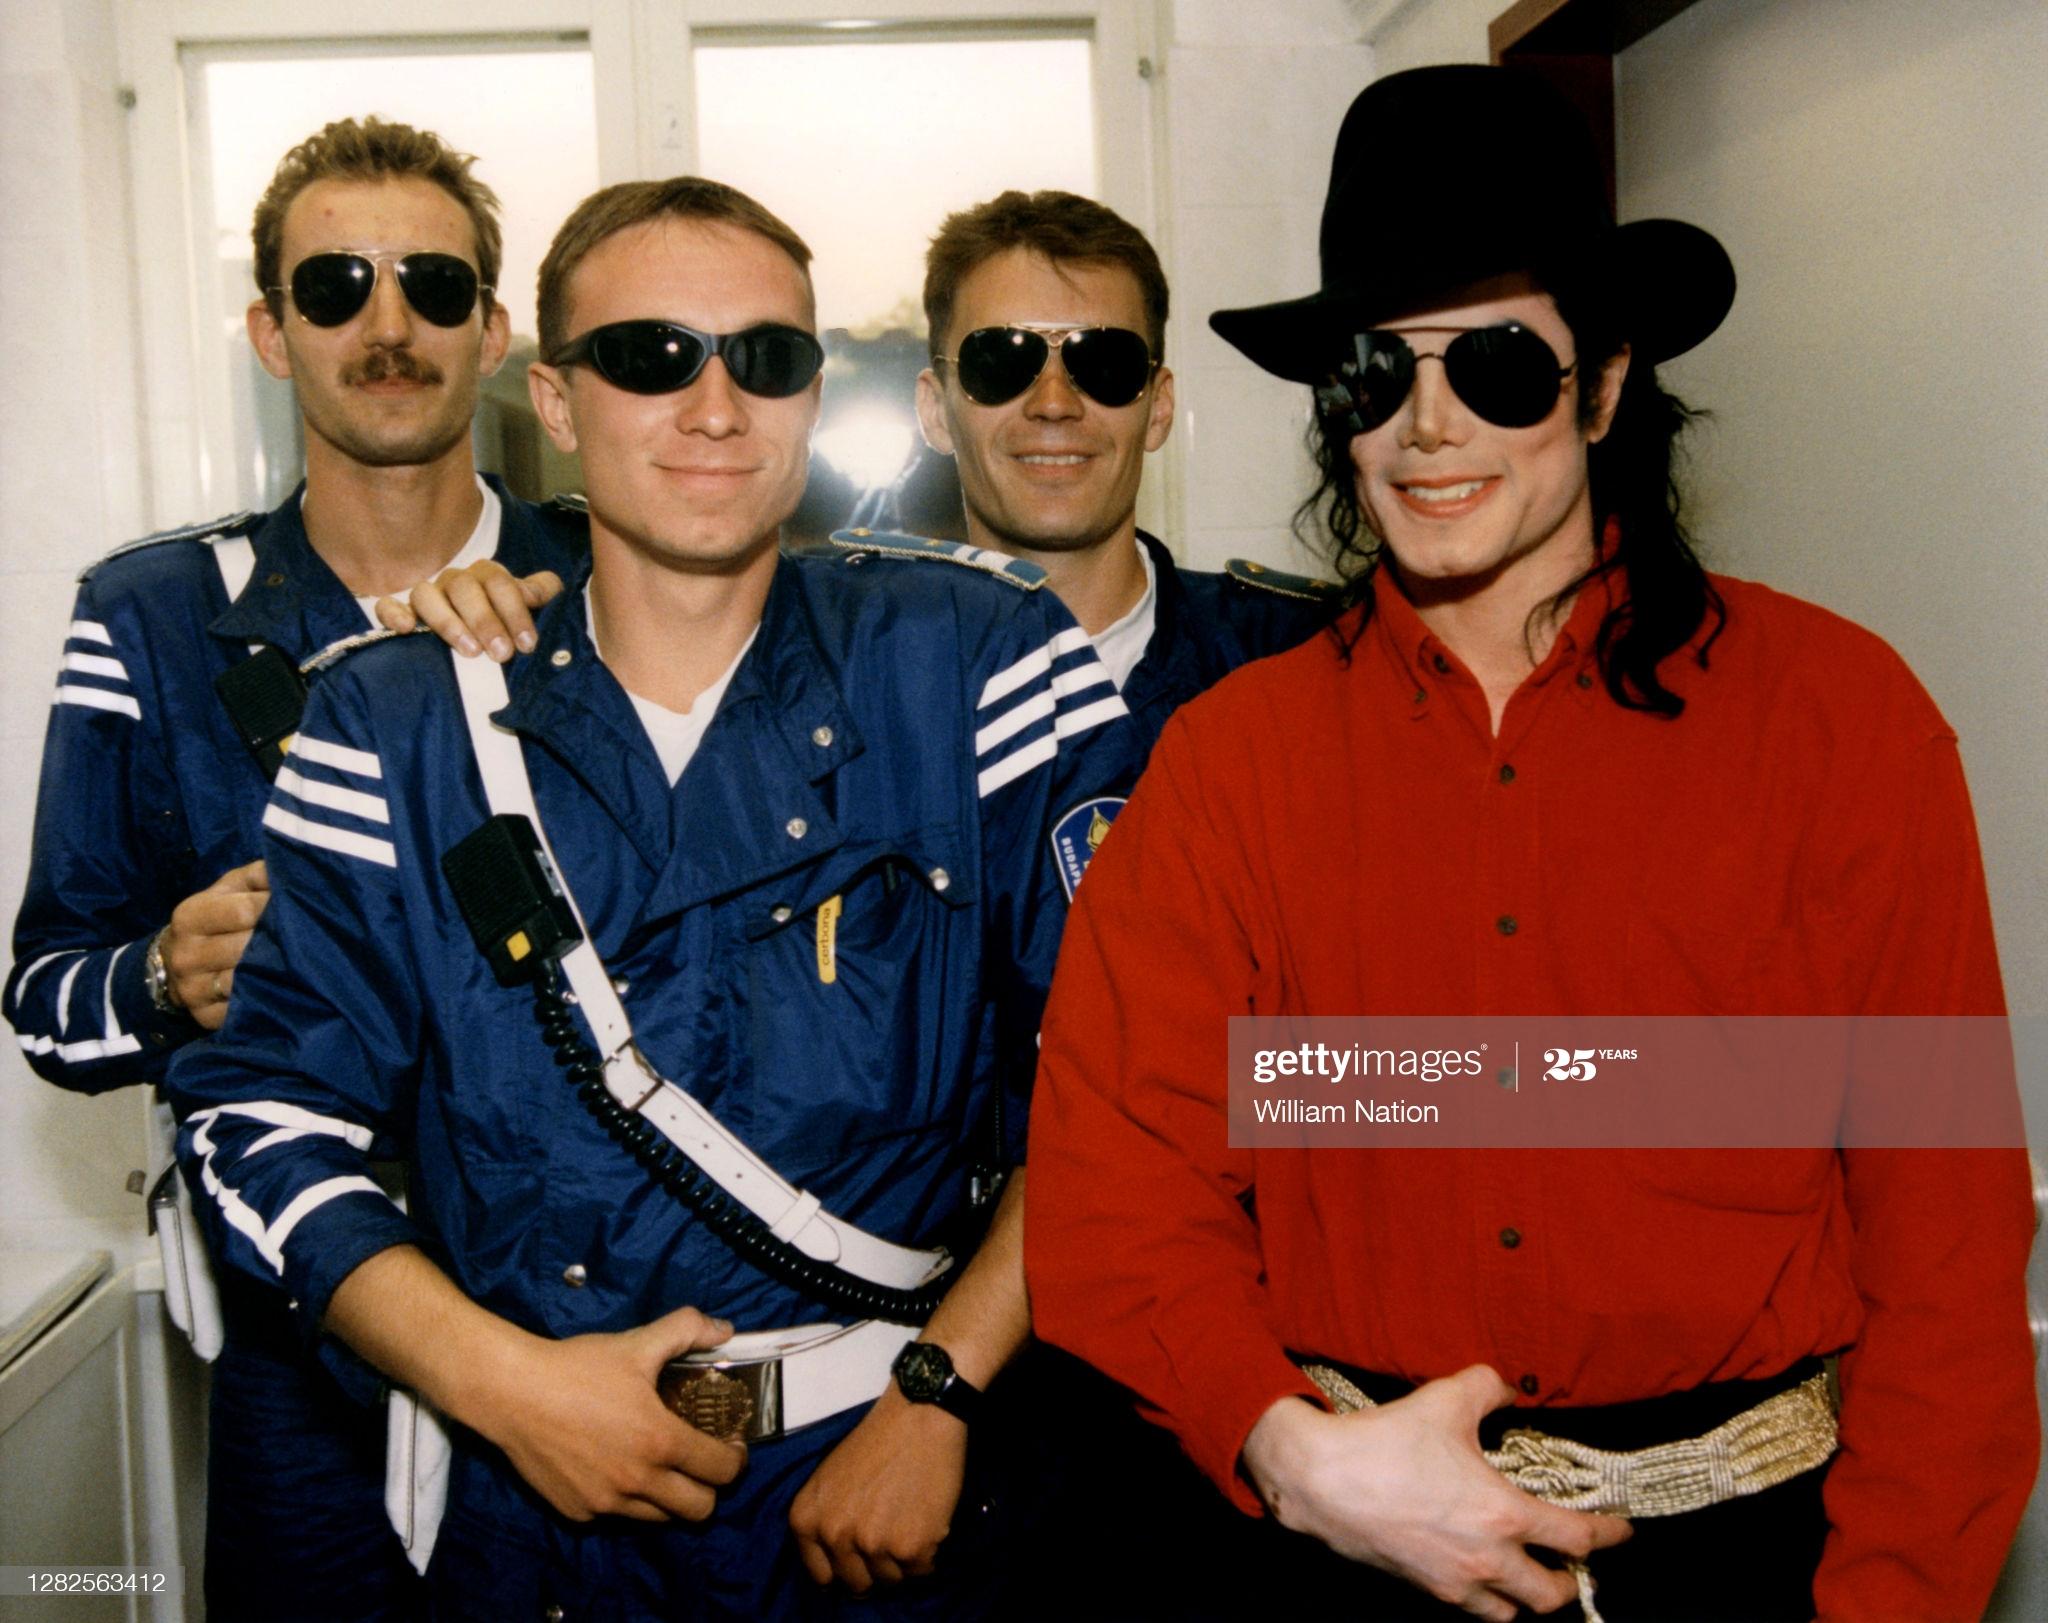 BUDAPEST-HUNGARY-JULY-1996-American-singer-songwriter-and-dancer-Michael-Jackson-1958-2009-arrives-w.jpg